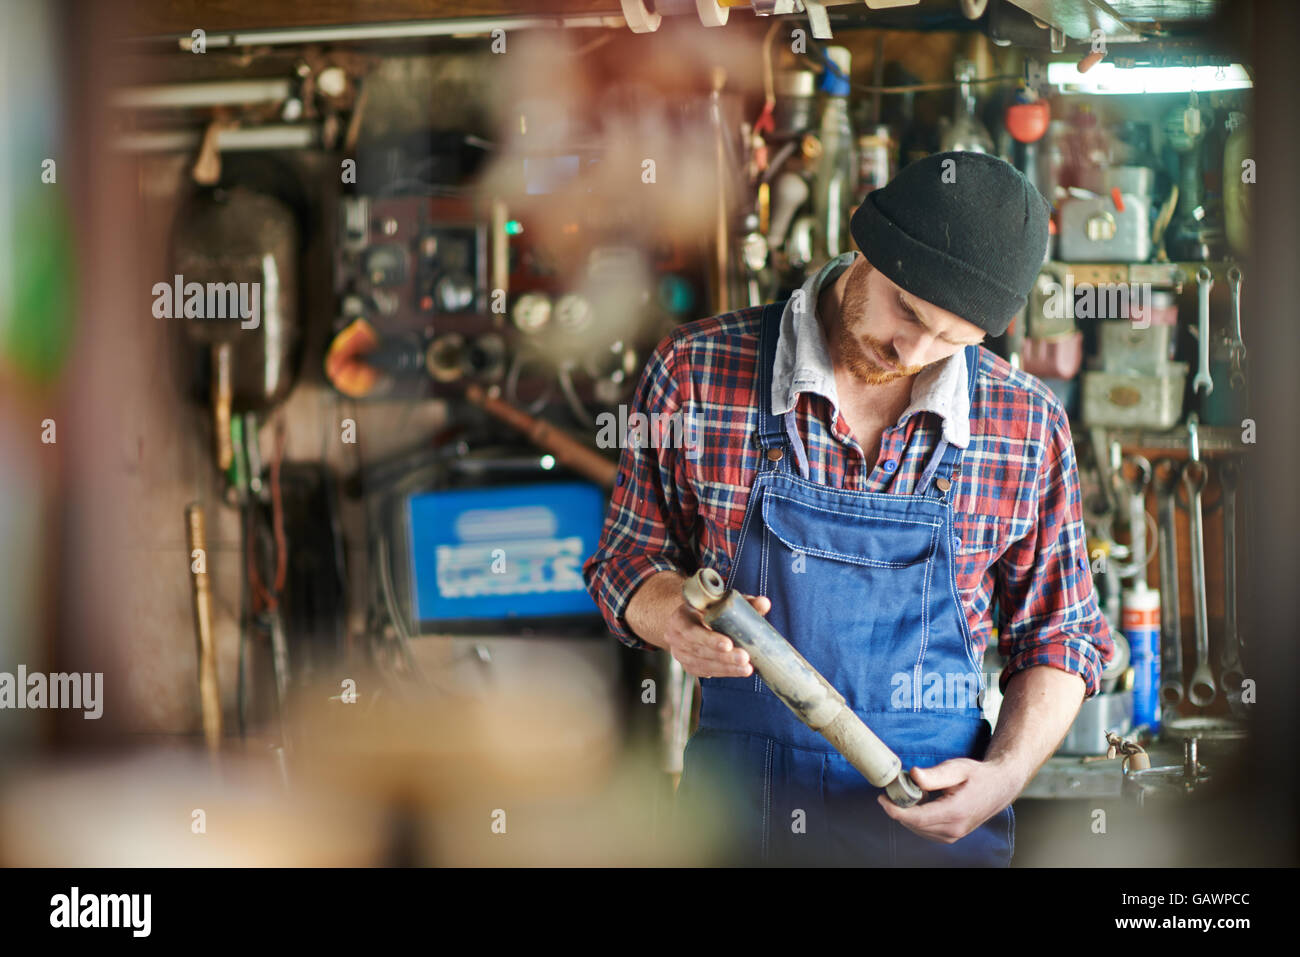 Handyman at work - Stock Image